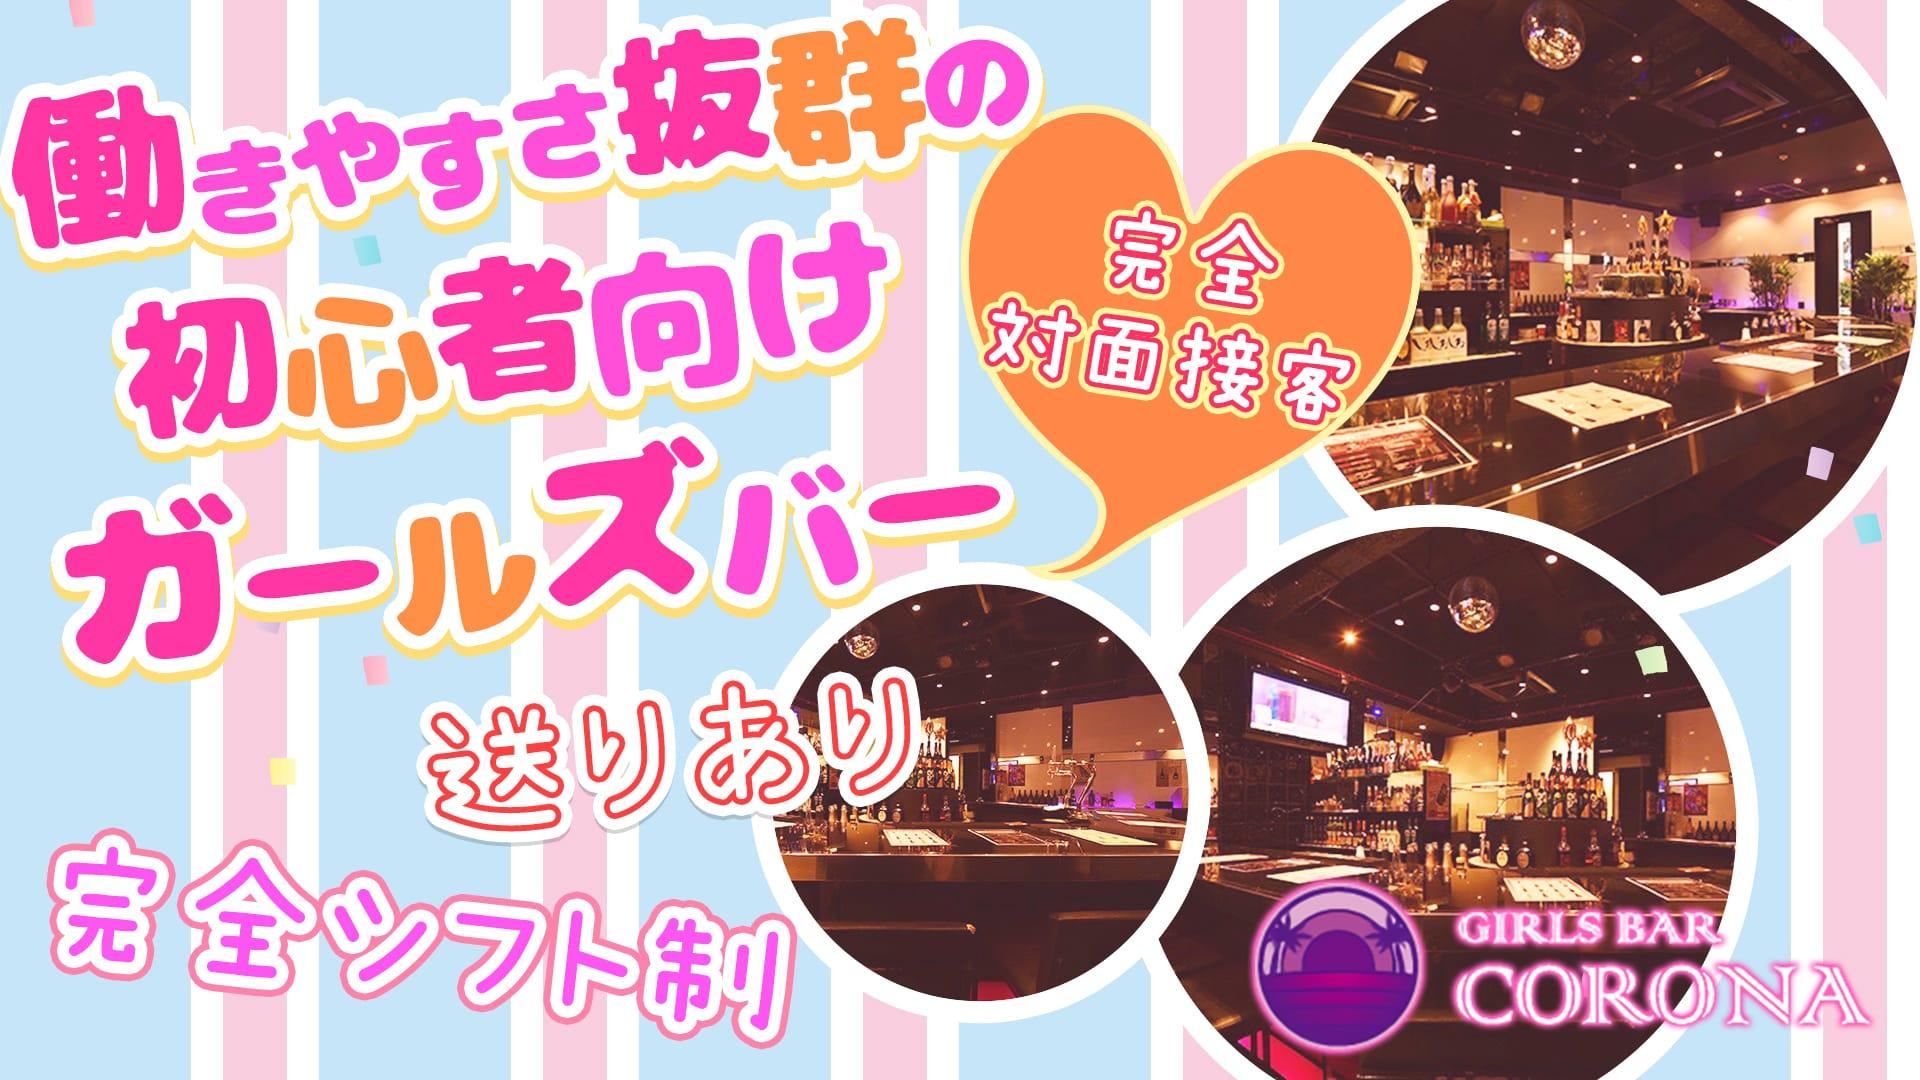 GIRL'S BAR CORONA(コロナ) 中洲ガールズバー TOP画像